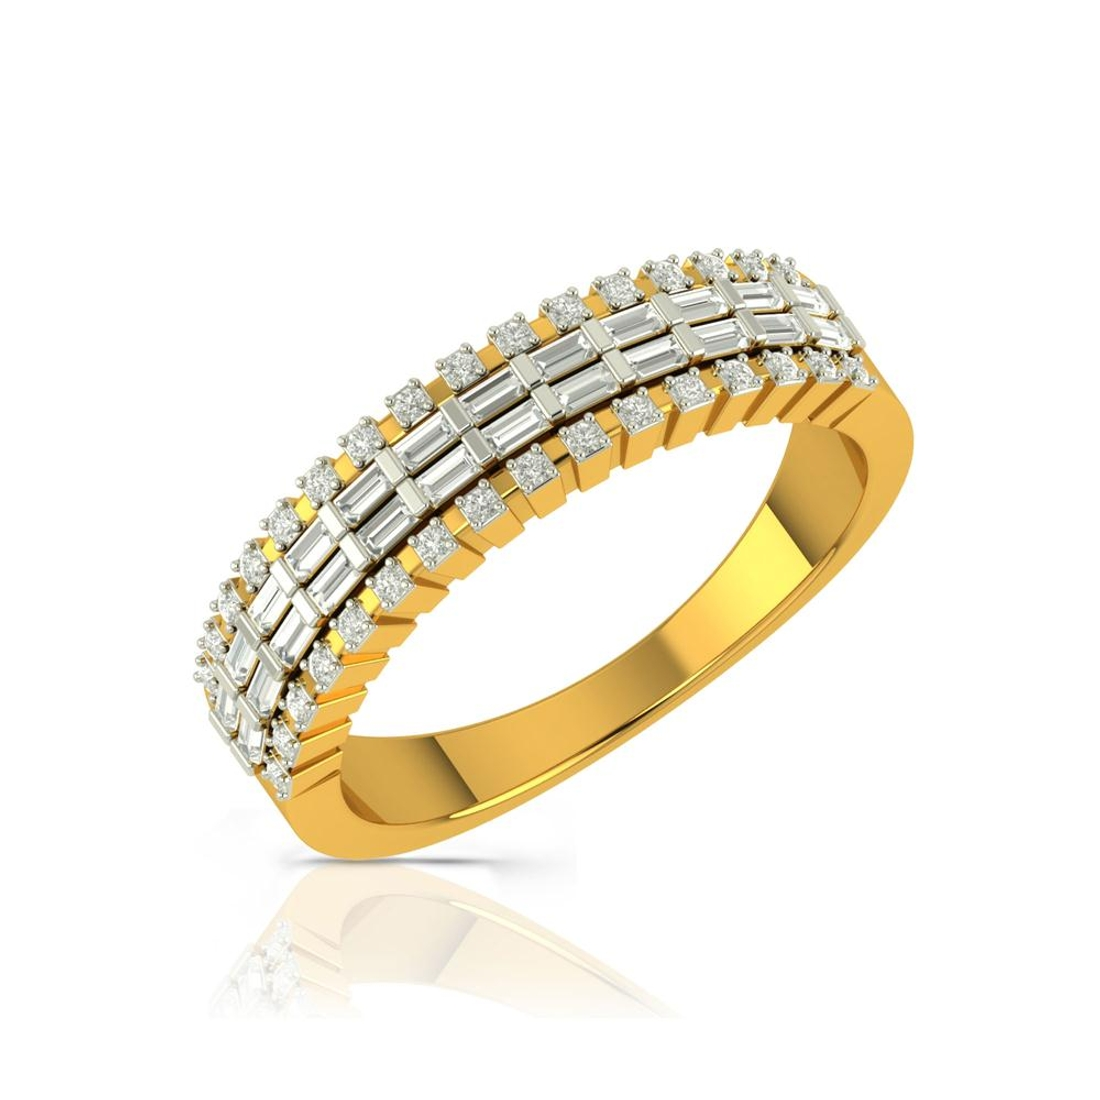 Buy Charu Jewels Diamond Ladies Ring CJLR0315 Online in India